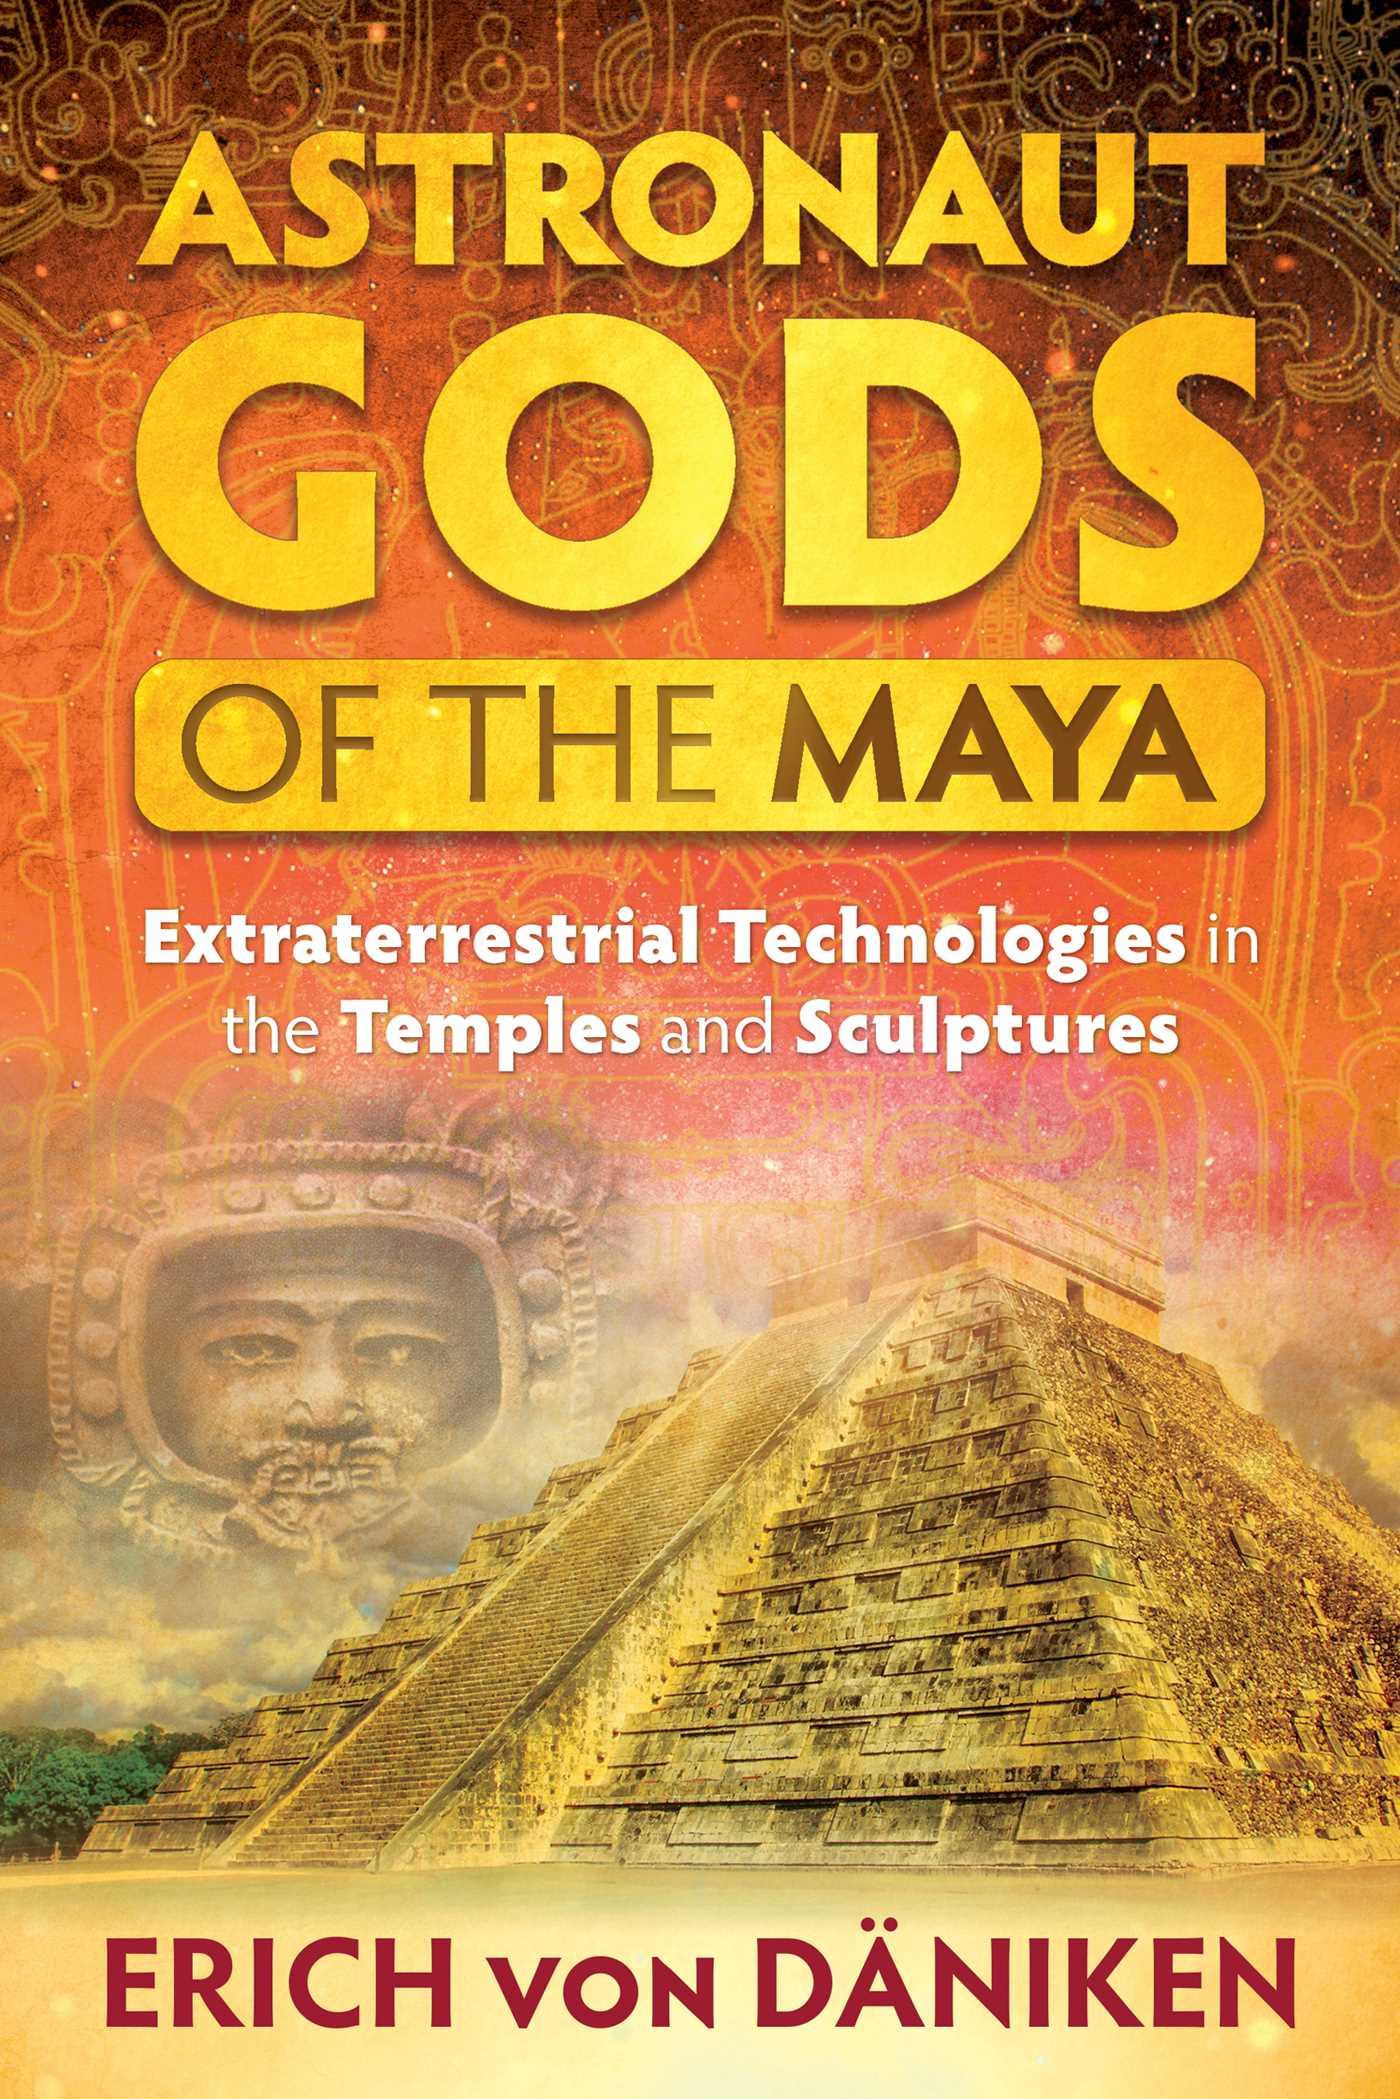 Astronaut gods of the maya 9781591432364 hr